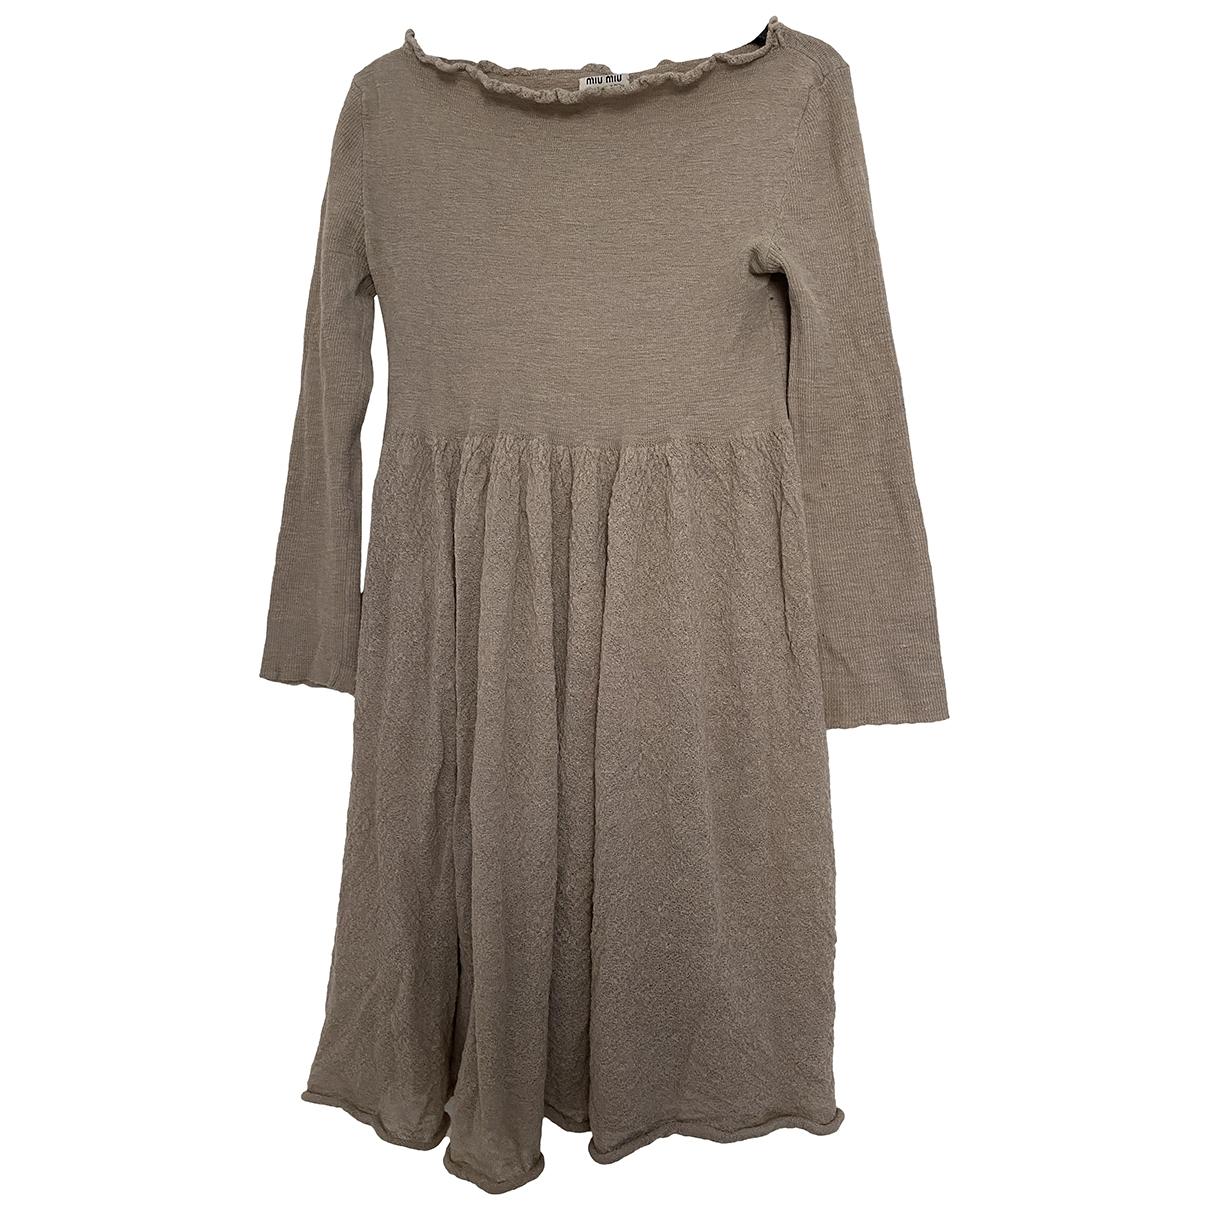 Miu Miu \N Beige Wool dress for Women 38 IT